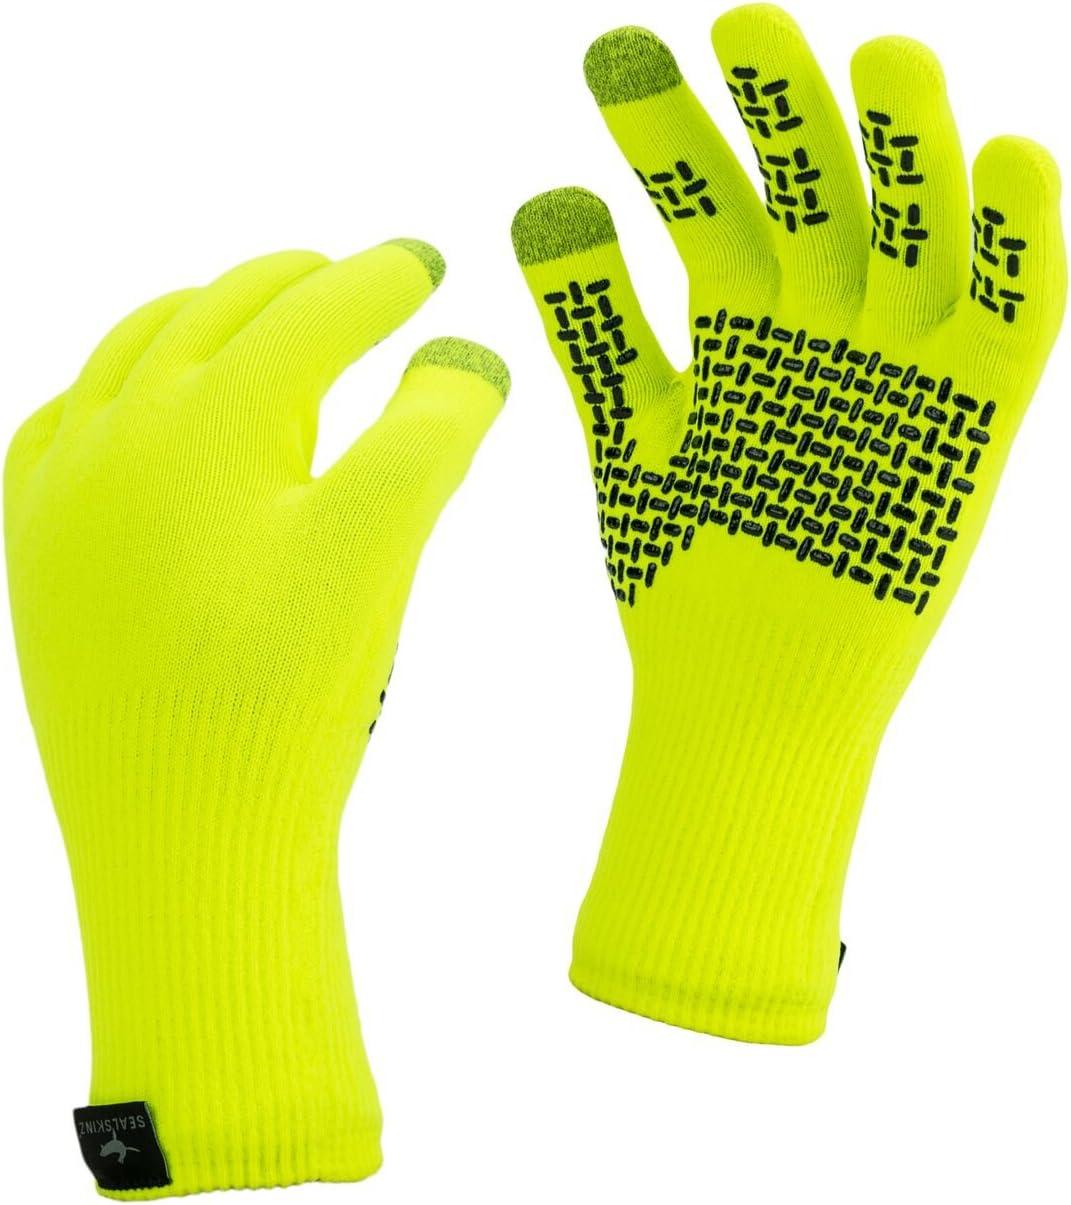 SEALSKINZ Waterproof All Weather Ultra Grip Knitted Glove